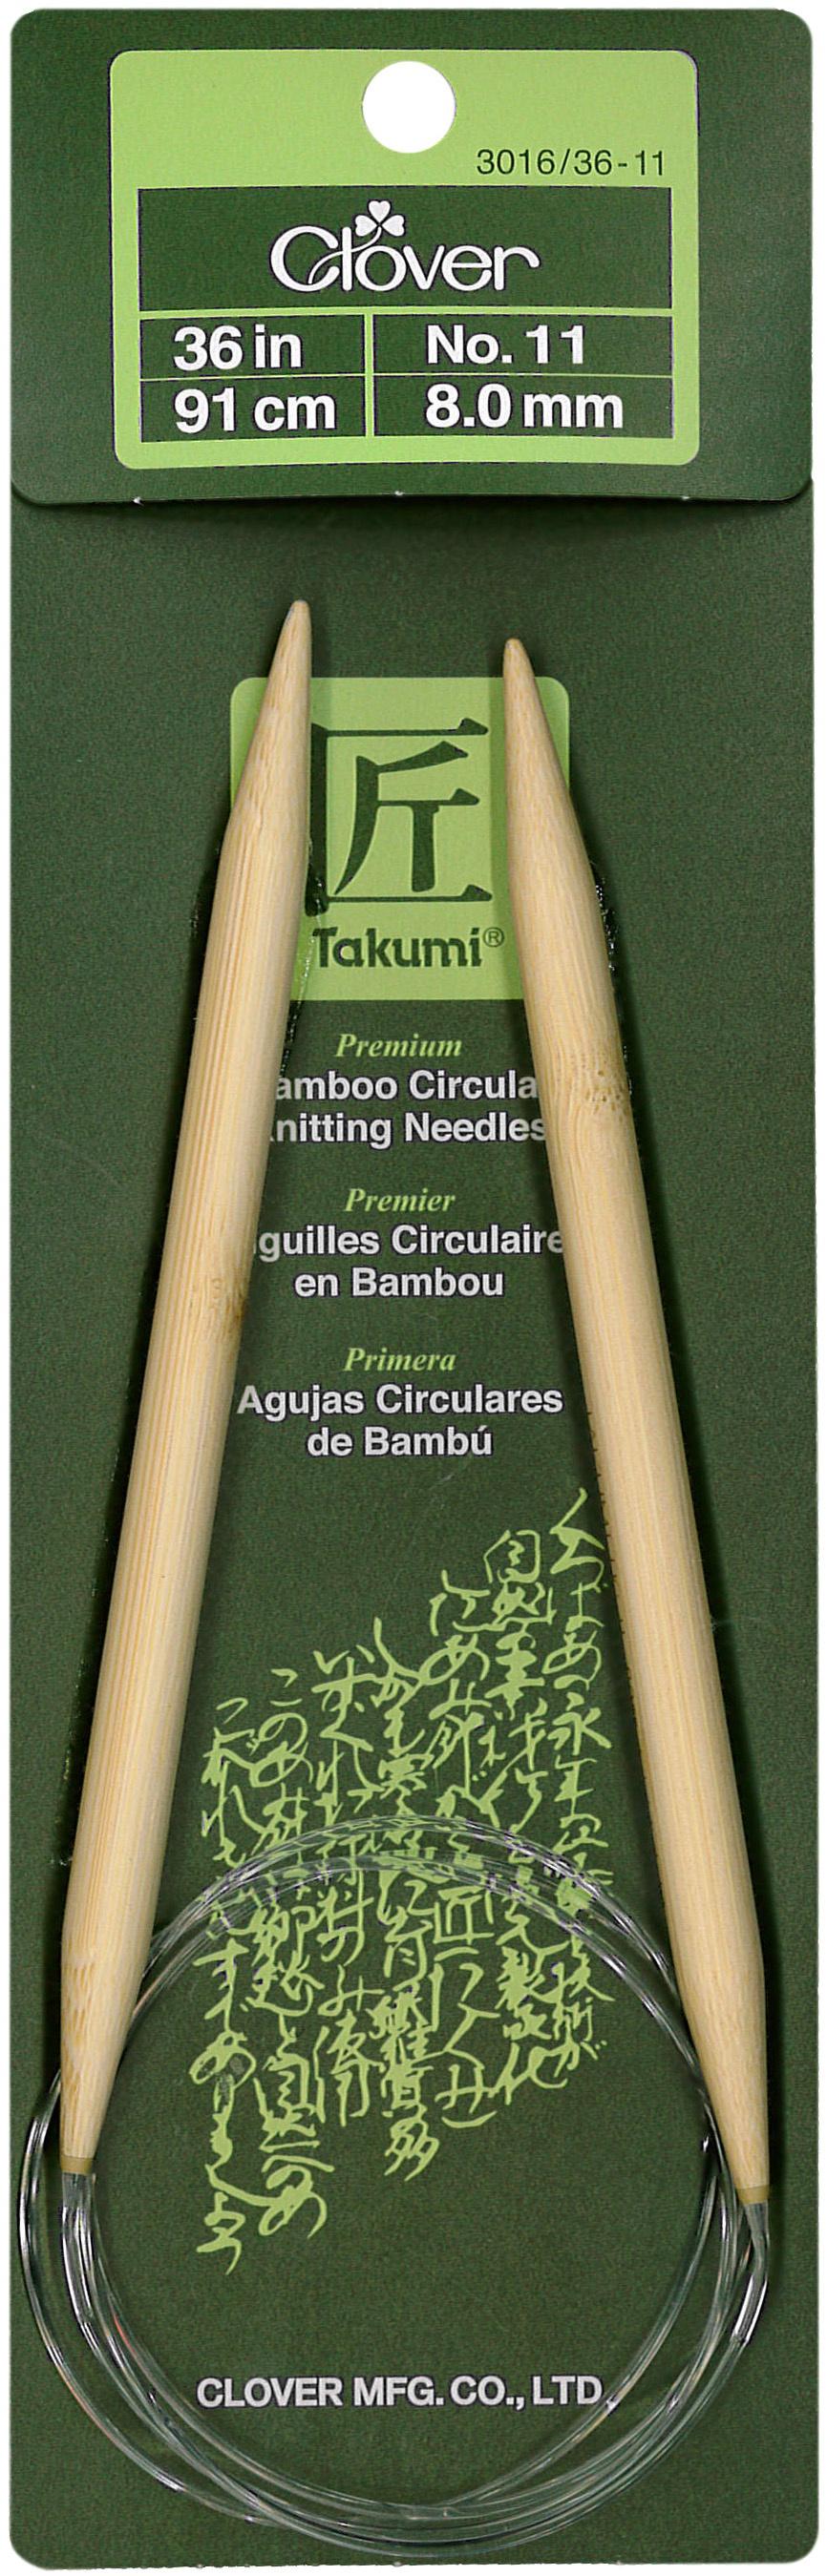 Takumi Bamboo Circular Knitting Needles 36-Size 11/8mm